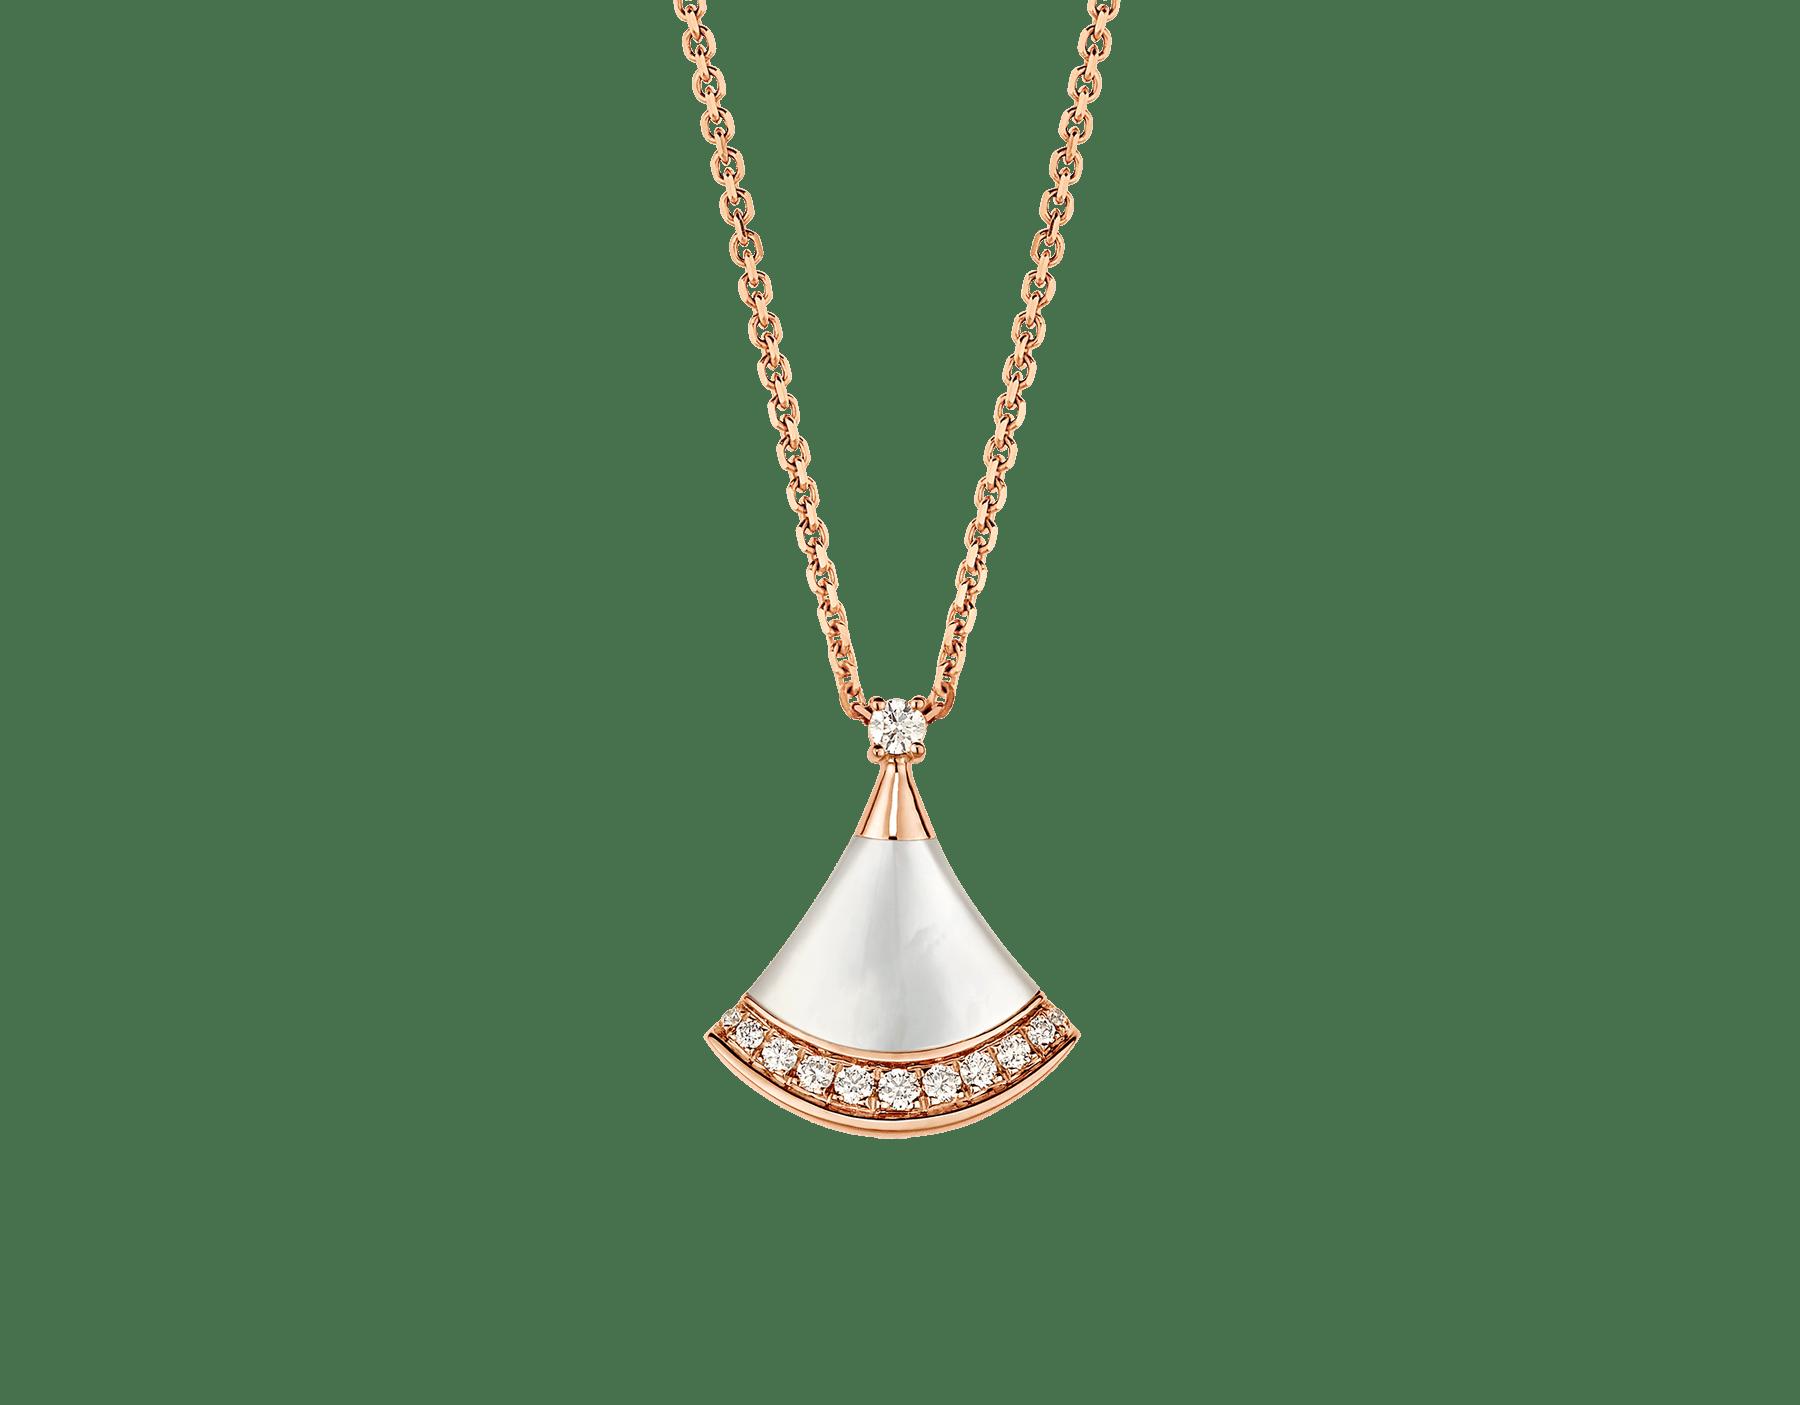 DIVAS' DREAM 18K 玫瑰金項鍊,鑲飾 1 顆鑽石(0.03 克拉)、珍珠母貝和密鑲鑽石(0.10 克拉)。 358365 image 1